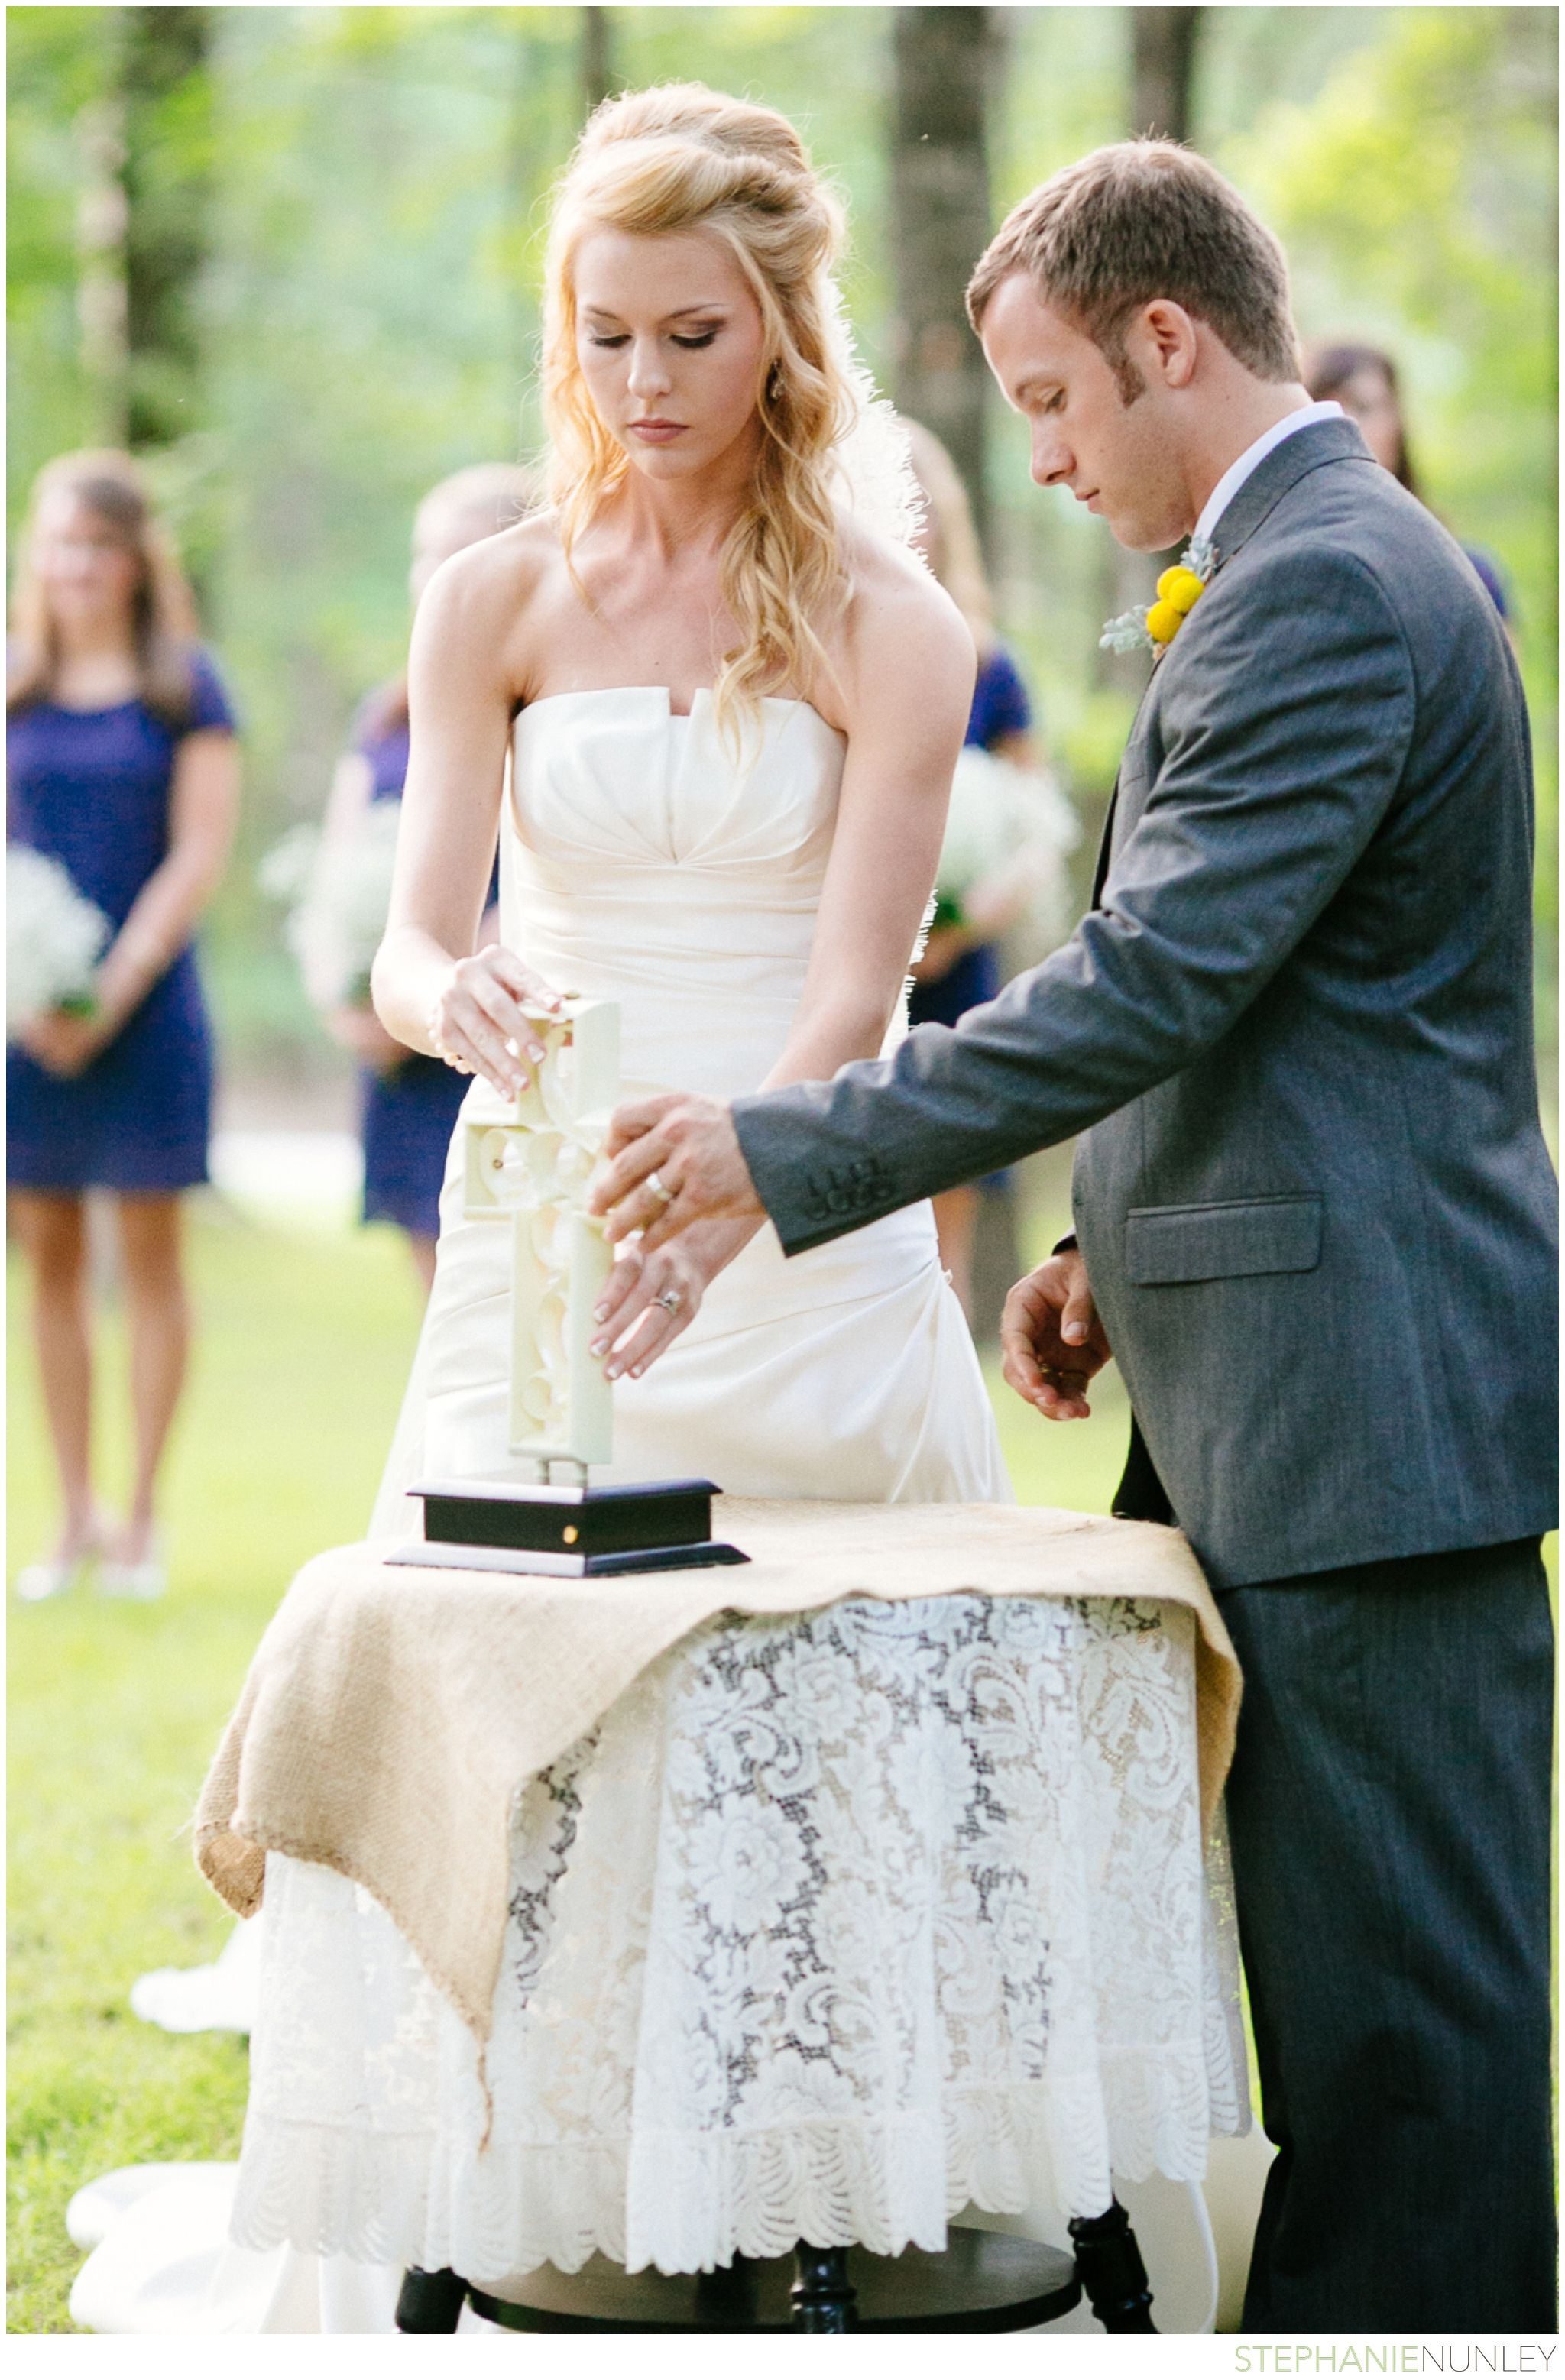 Outdoor Christian Wedding Ceremony Unity Cross